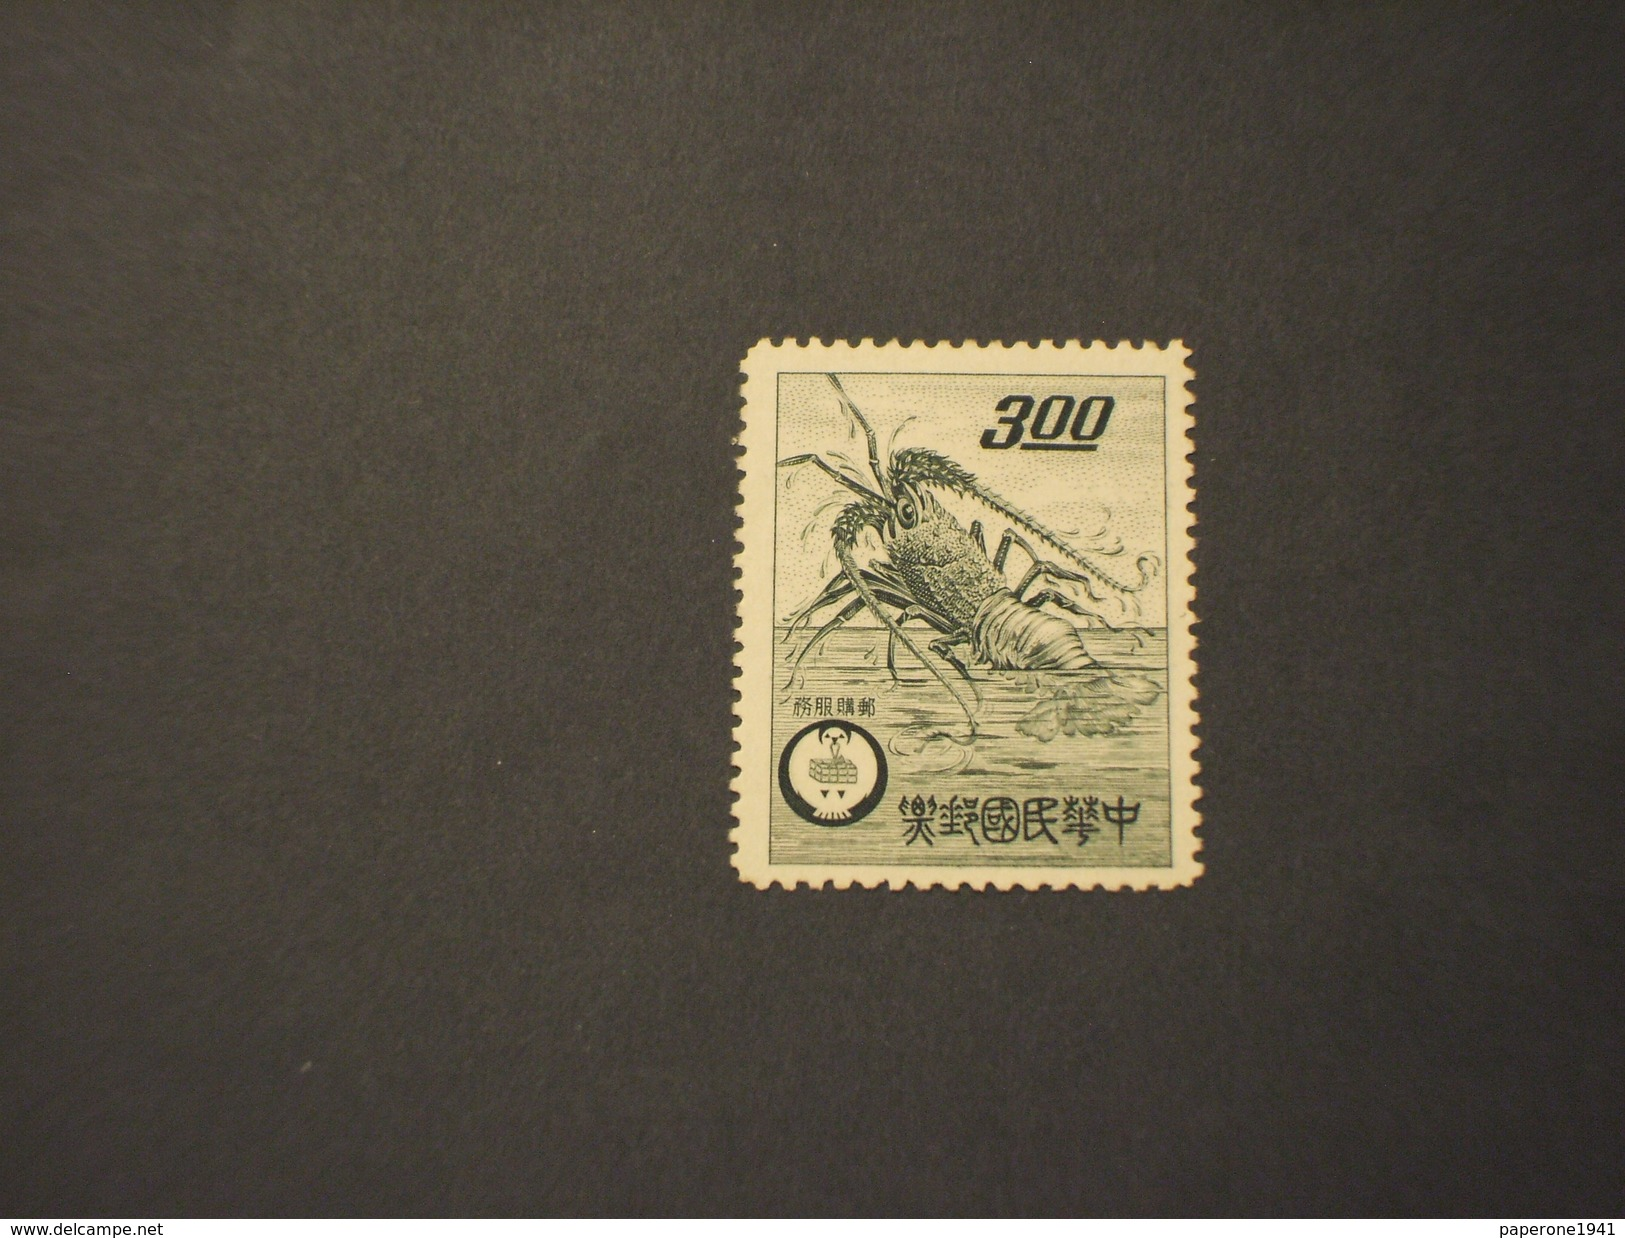 TAIWAN/FORMOSA - 1961 GRANCHIO - NUOVO(++) - 1945-... Republic Of China